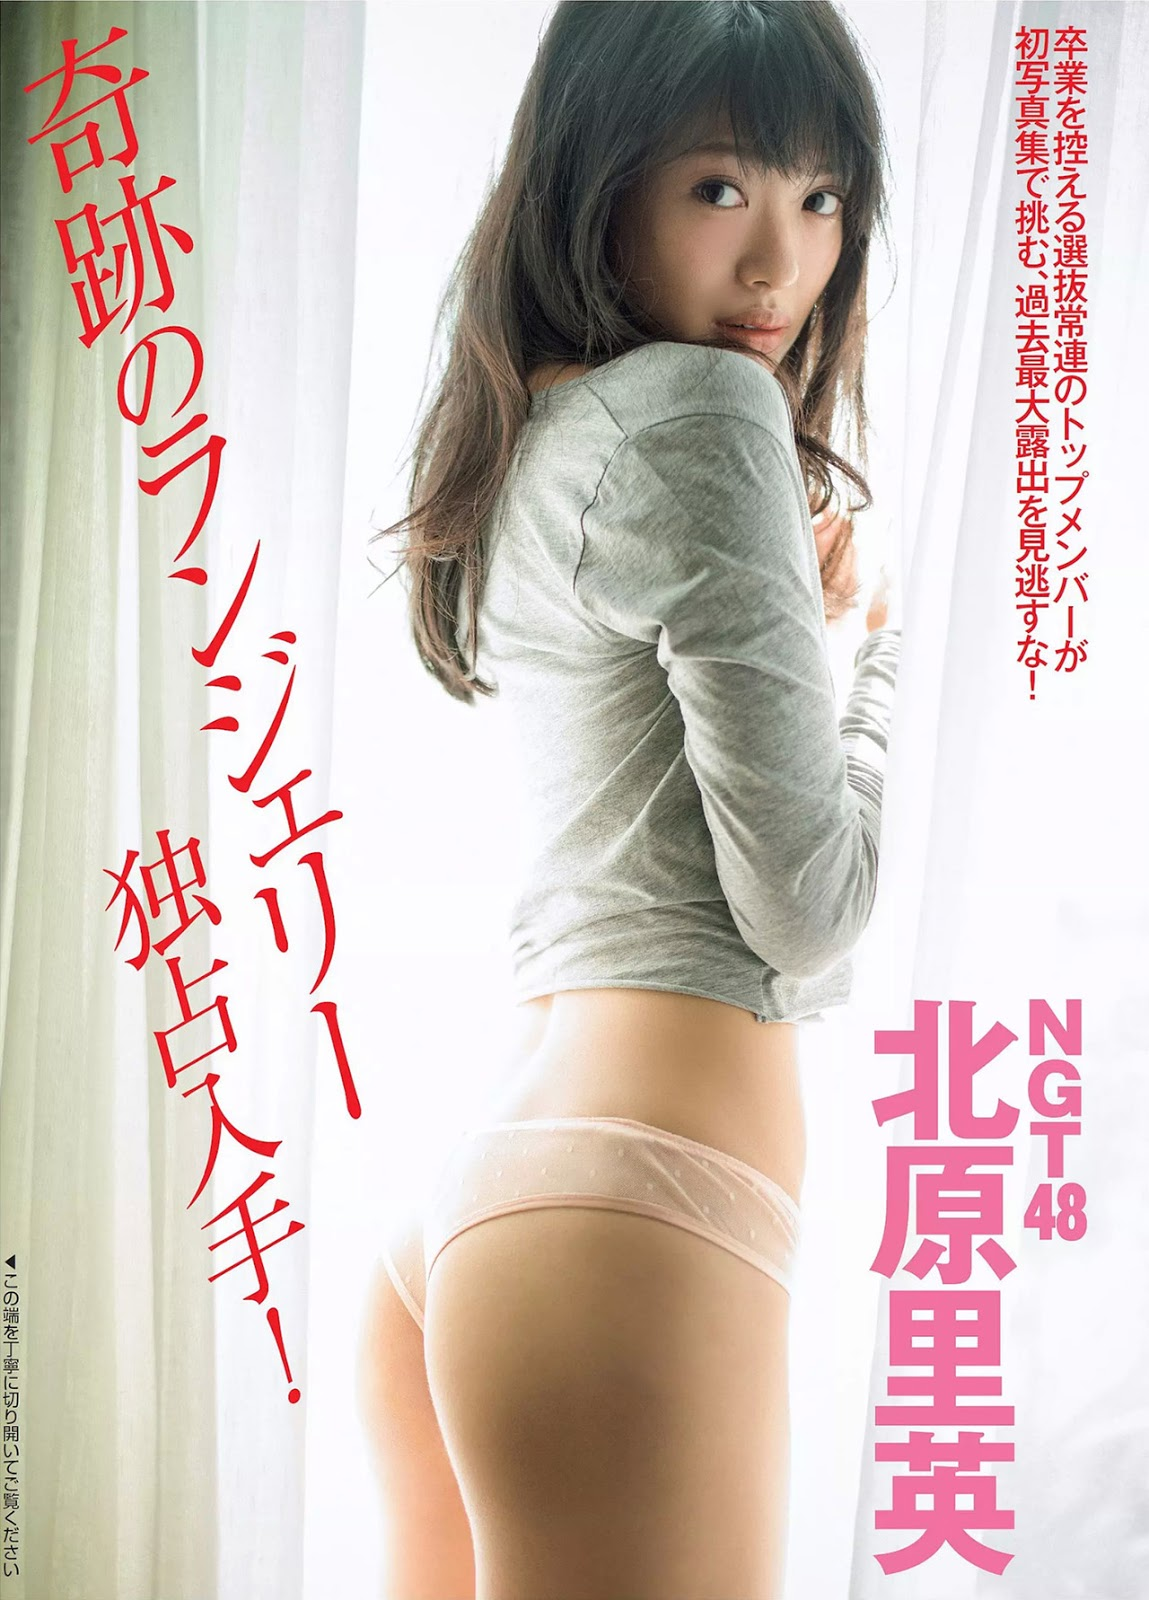 Kitahara Rie 北原里英, FLASH 電子版 2017.12.19 (フラッシュ 2017年12月19日号)